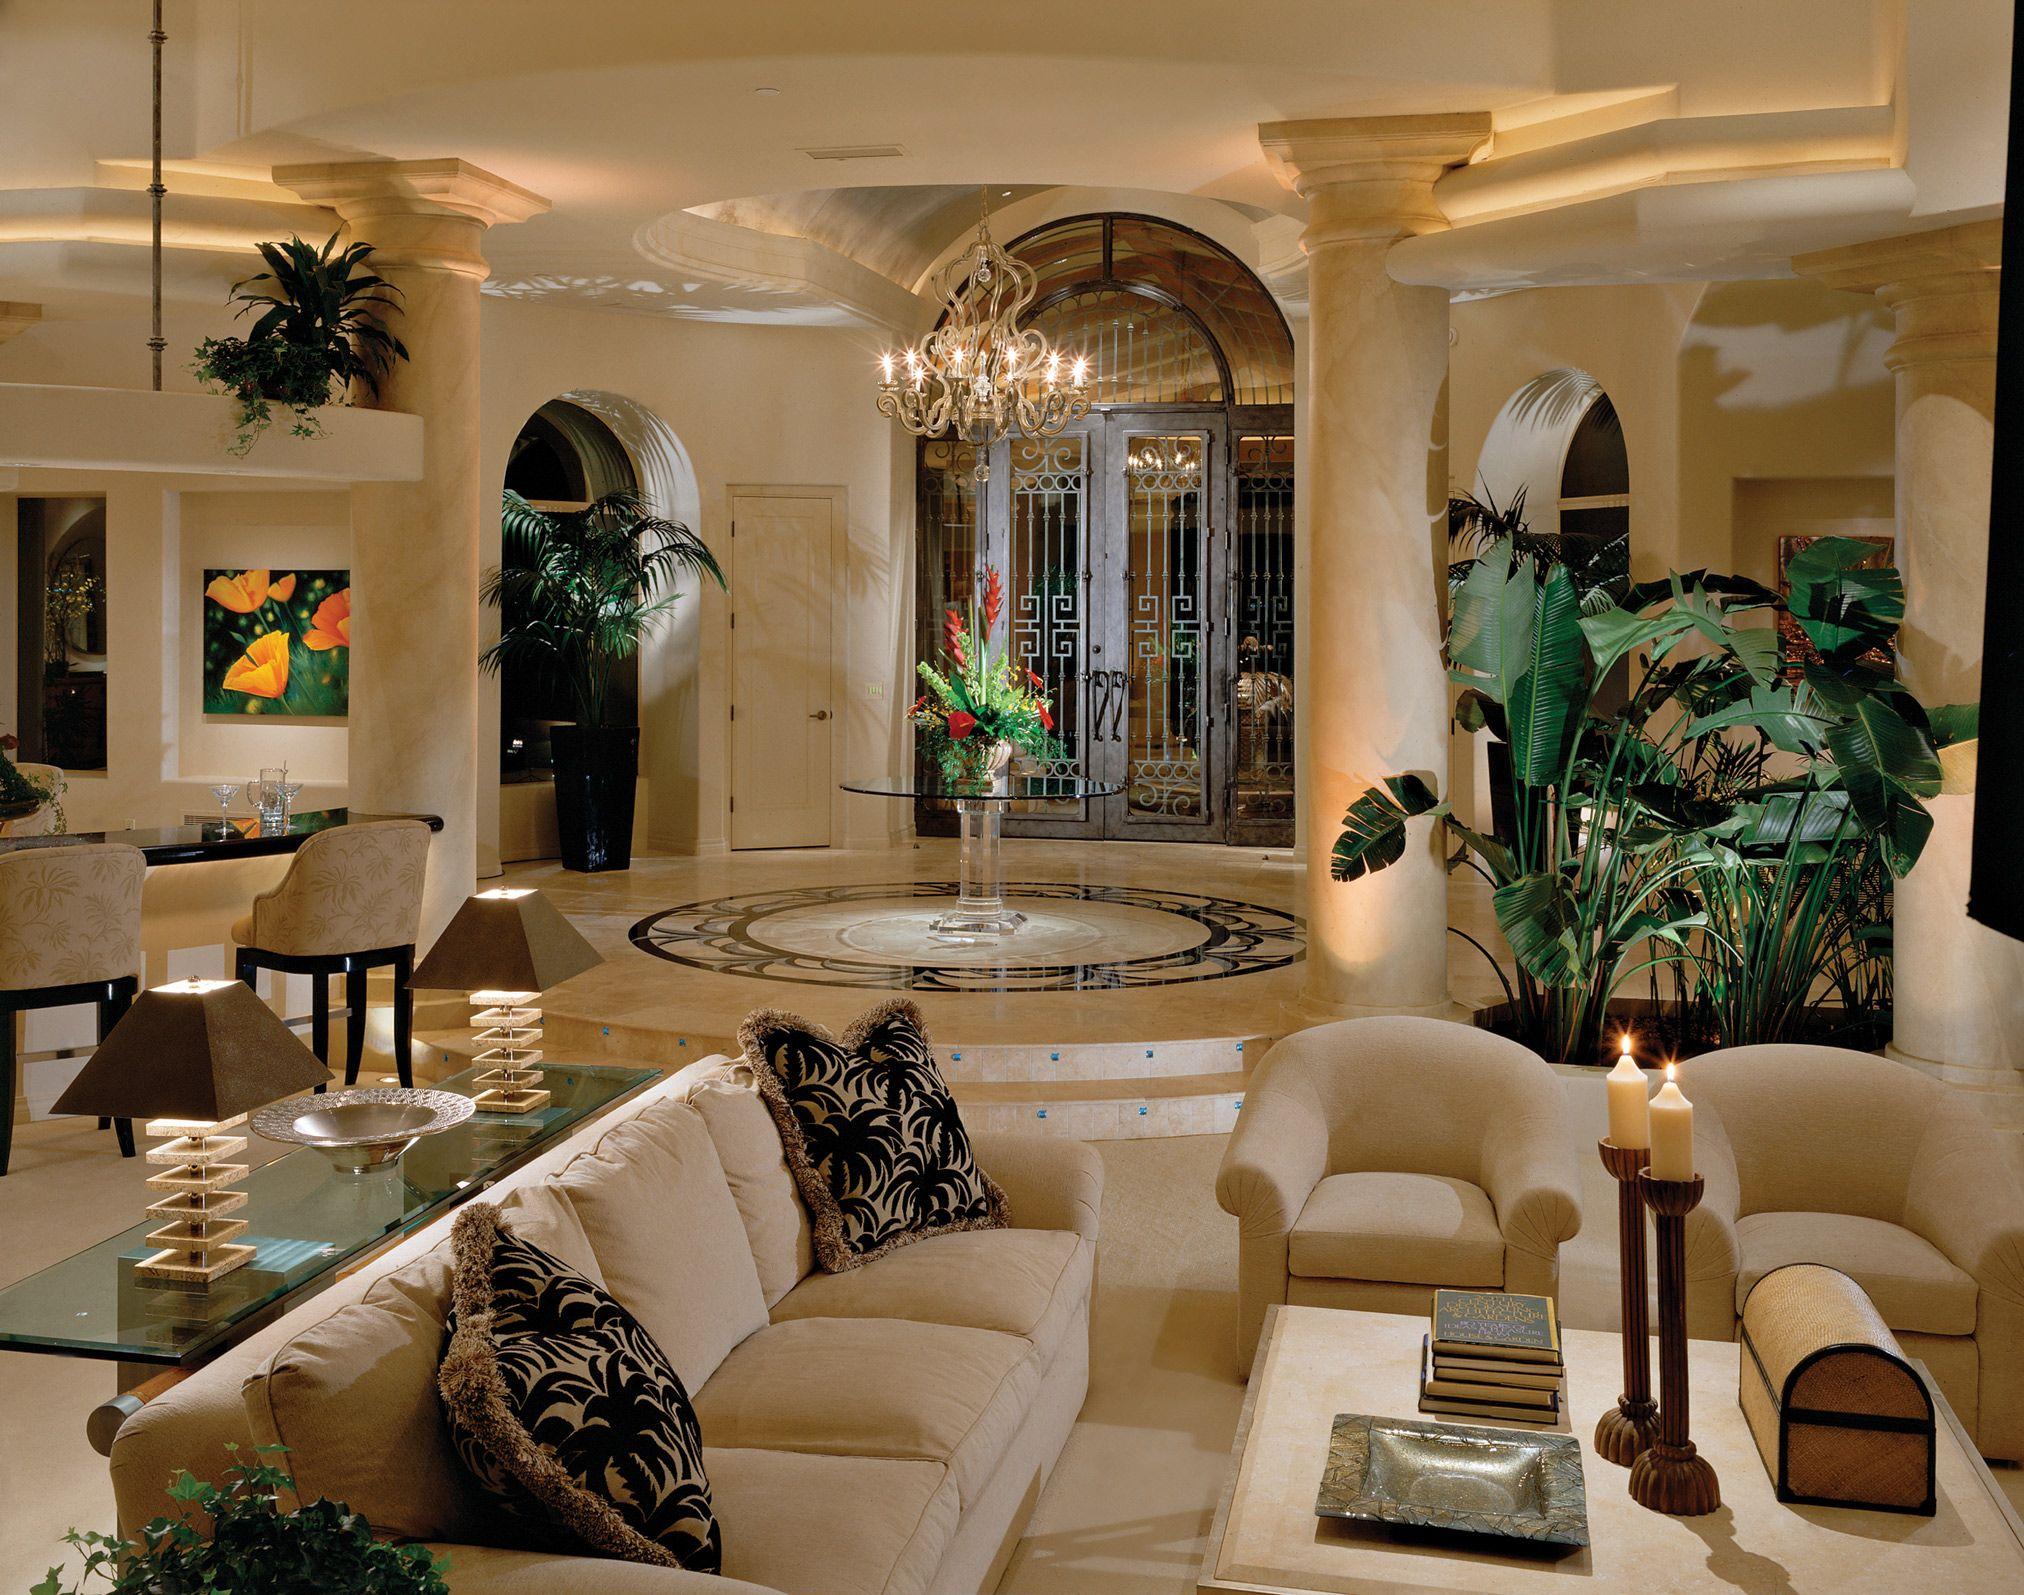 Hilton Head Island Sonesta Resort With Images Dream Living